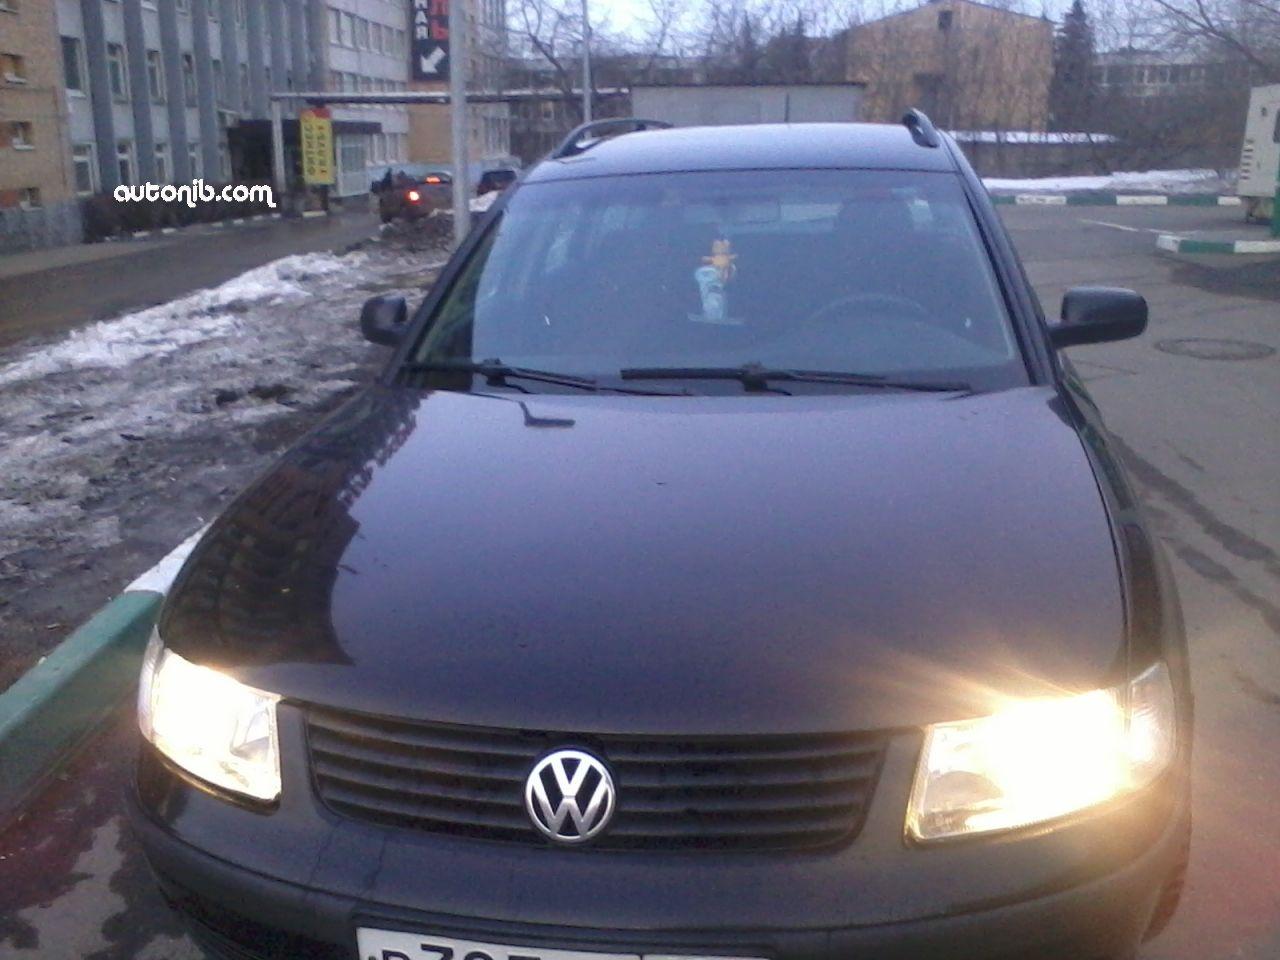 Купить Volkswagen Passat Variant 1999 года в городе Москва